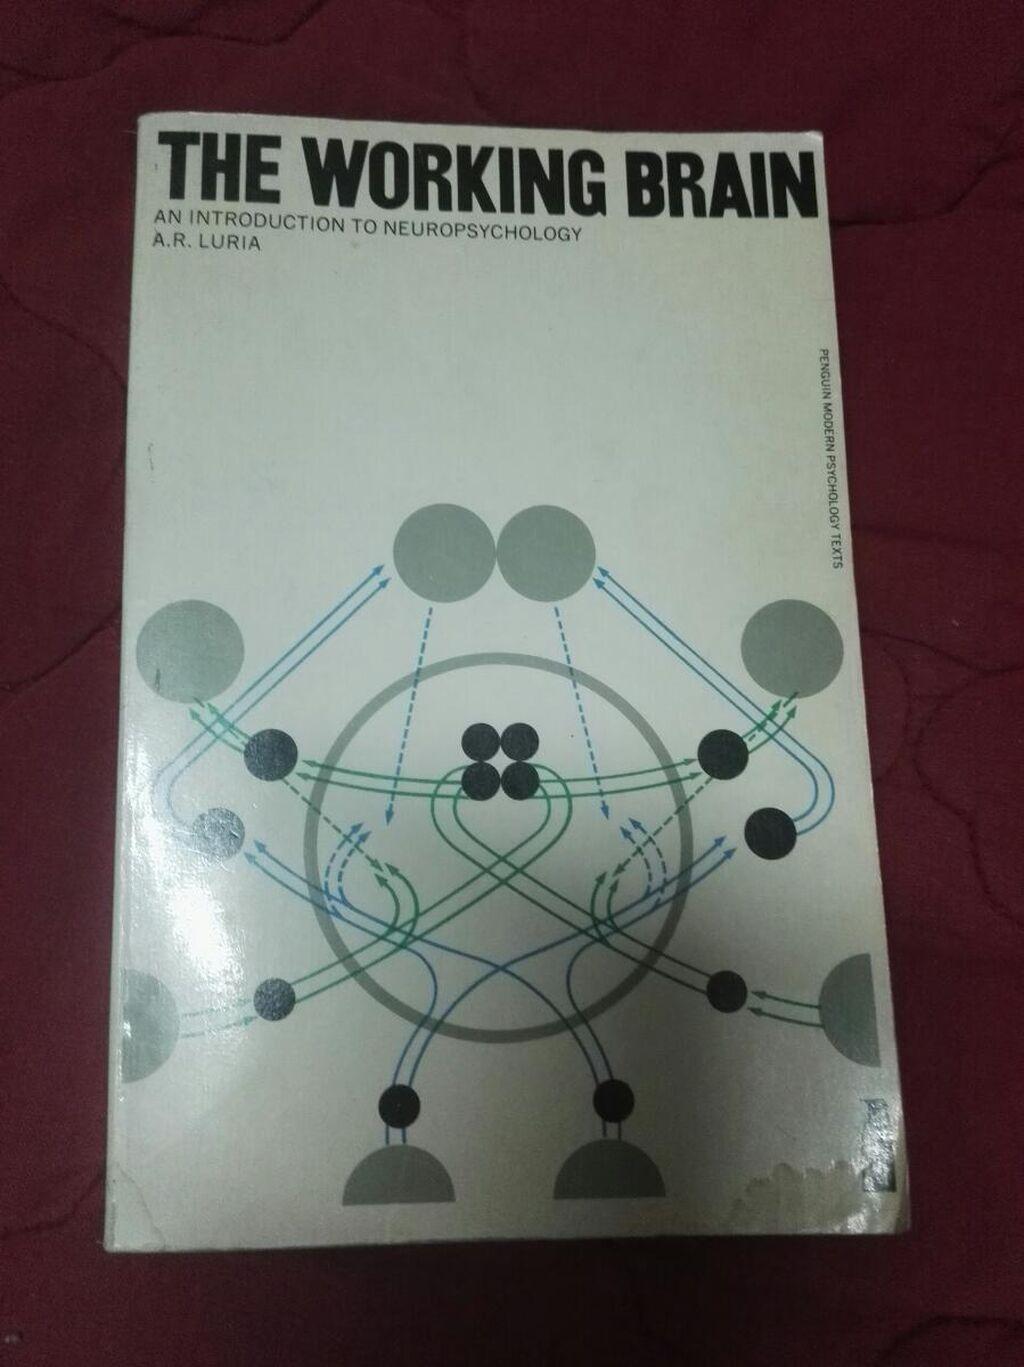 The working brain